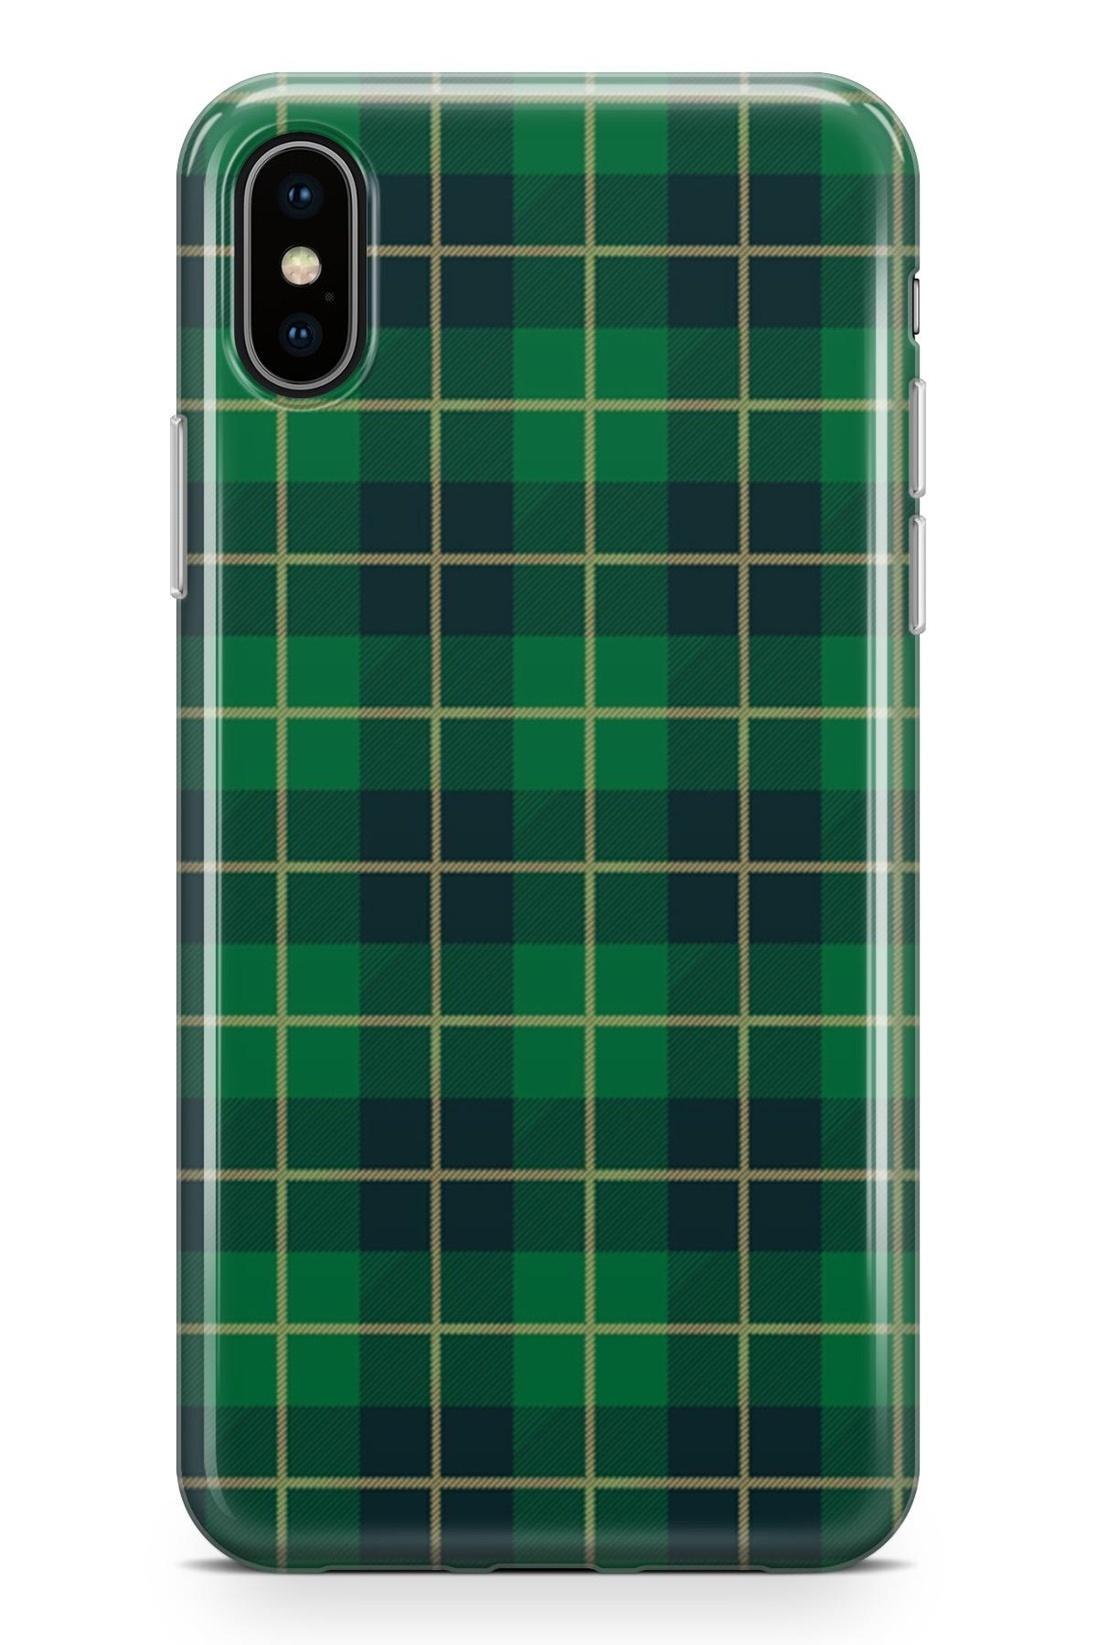 Standart Lopard Apple İphone Xs Max Kılıf Retro Kumaş Yeşil 2 Kapak